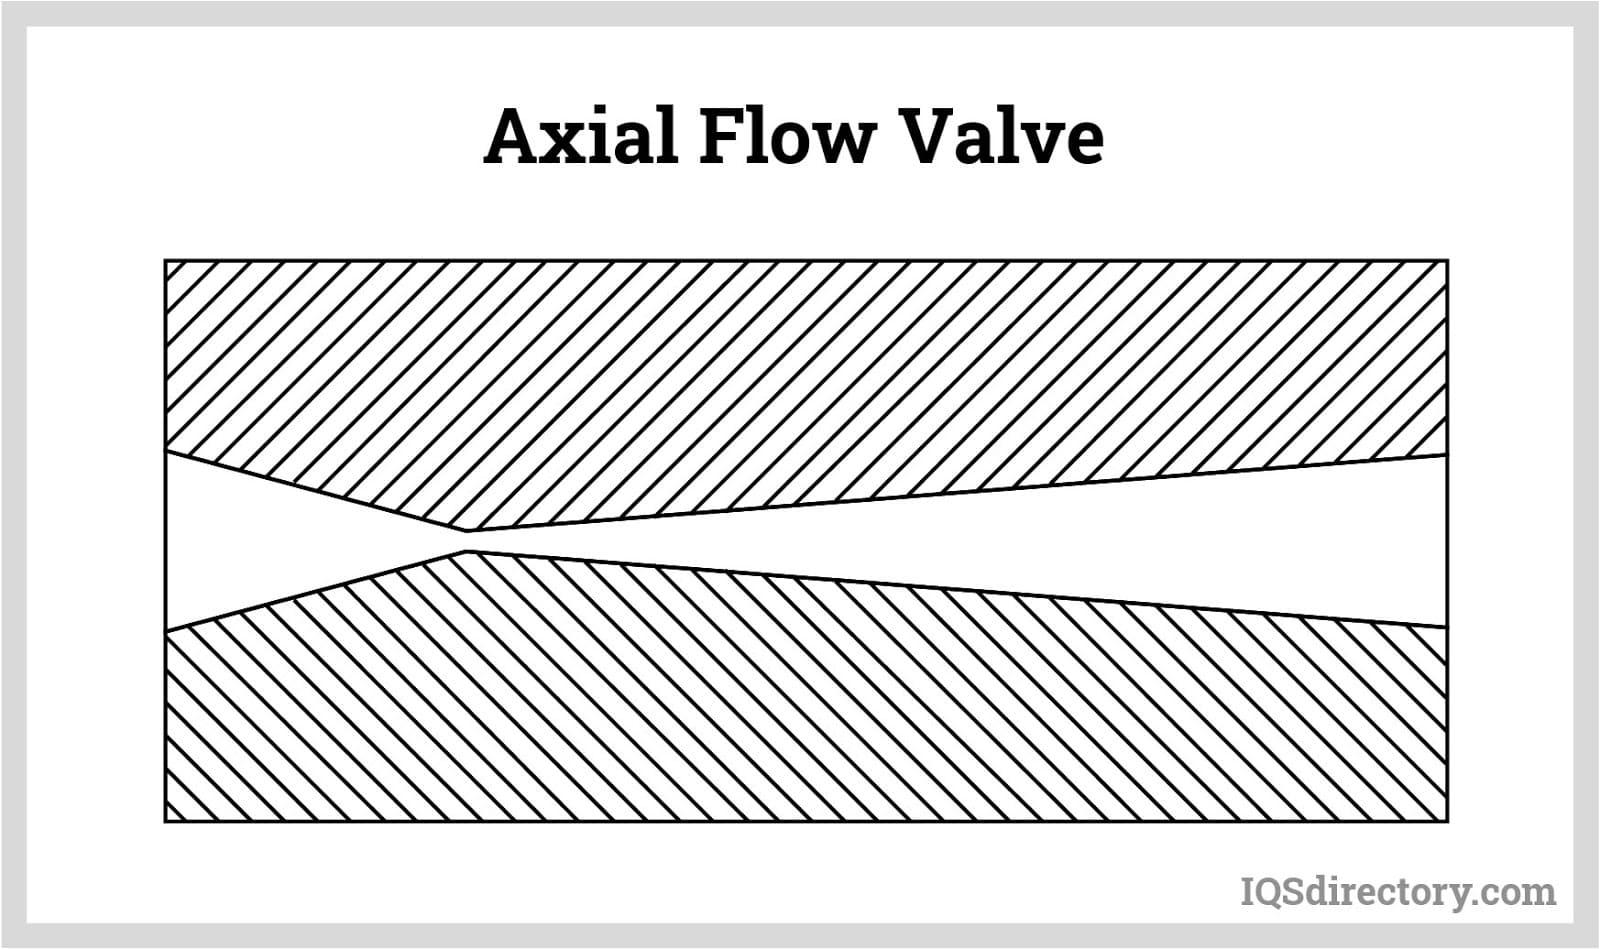 Axial Flow Valve